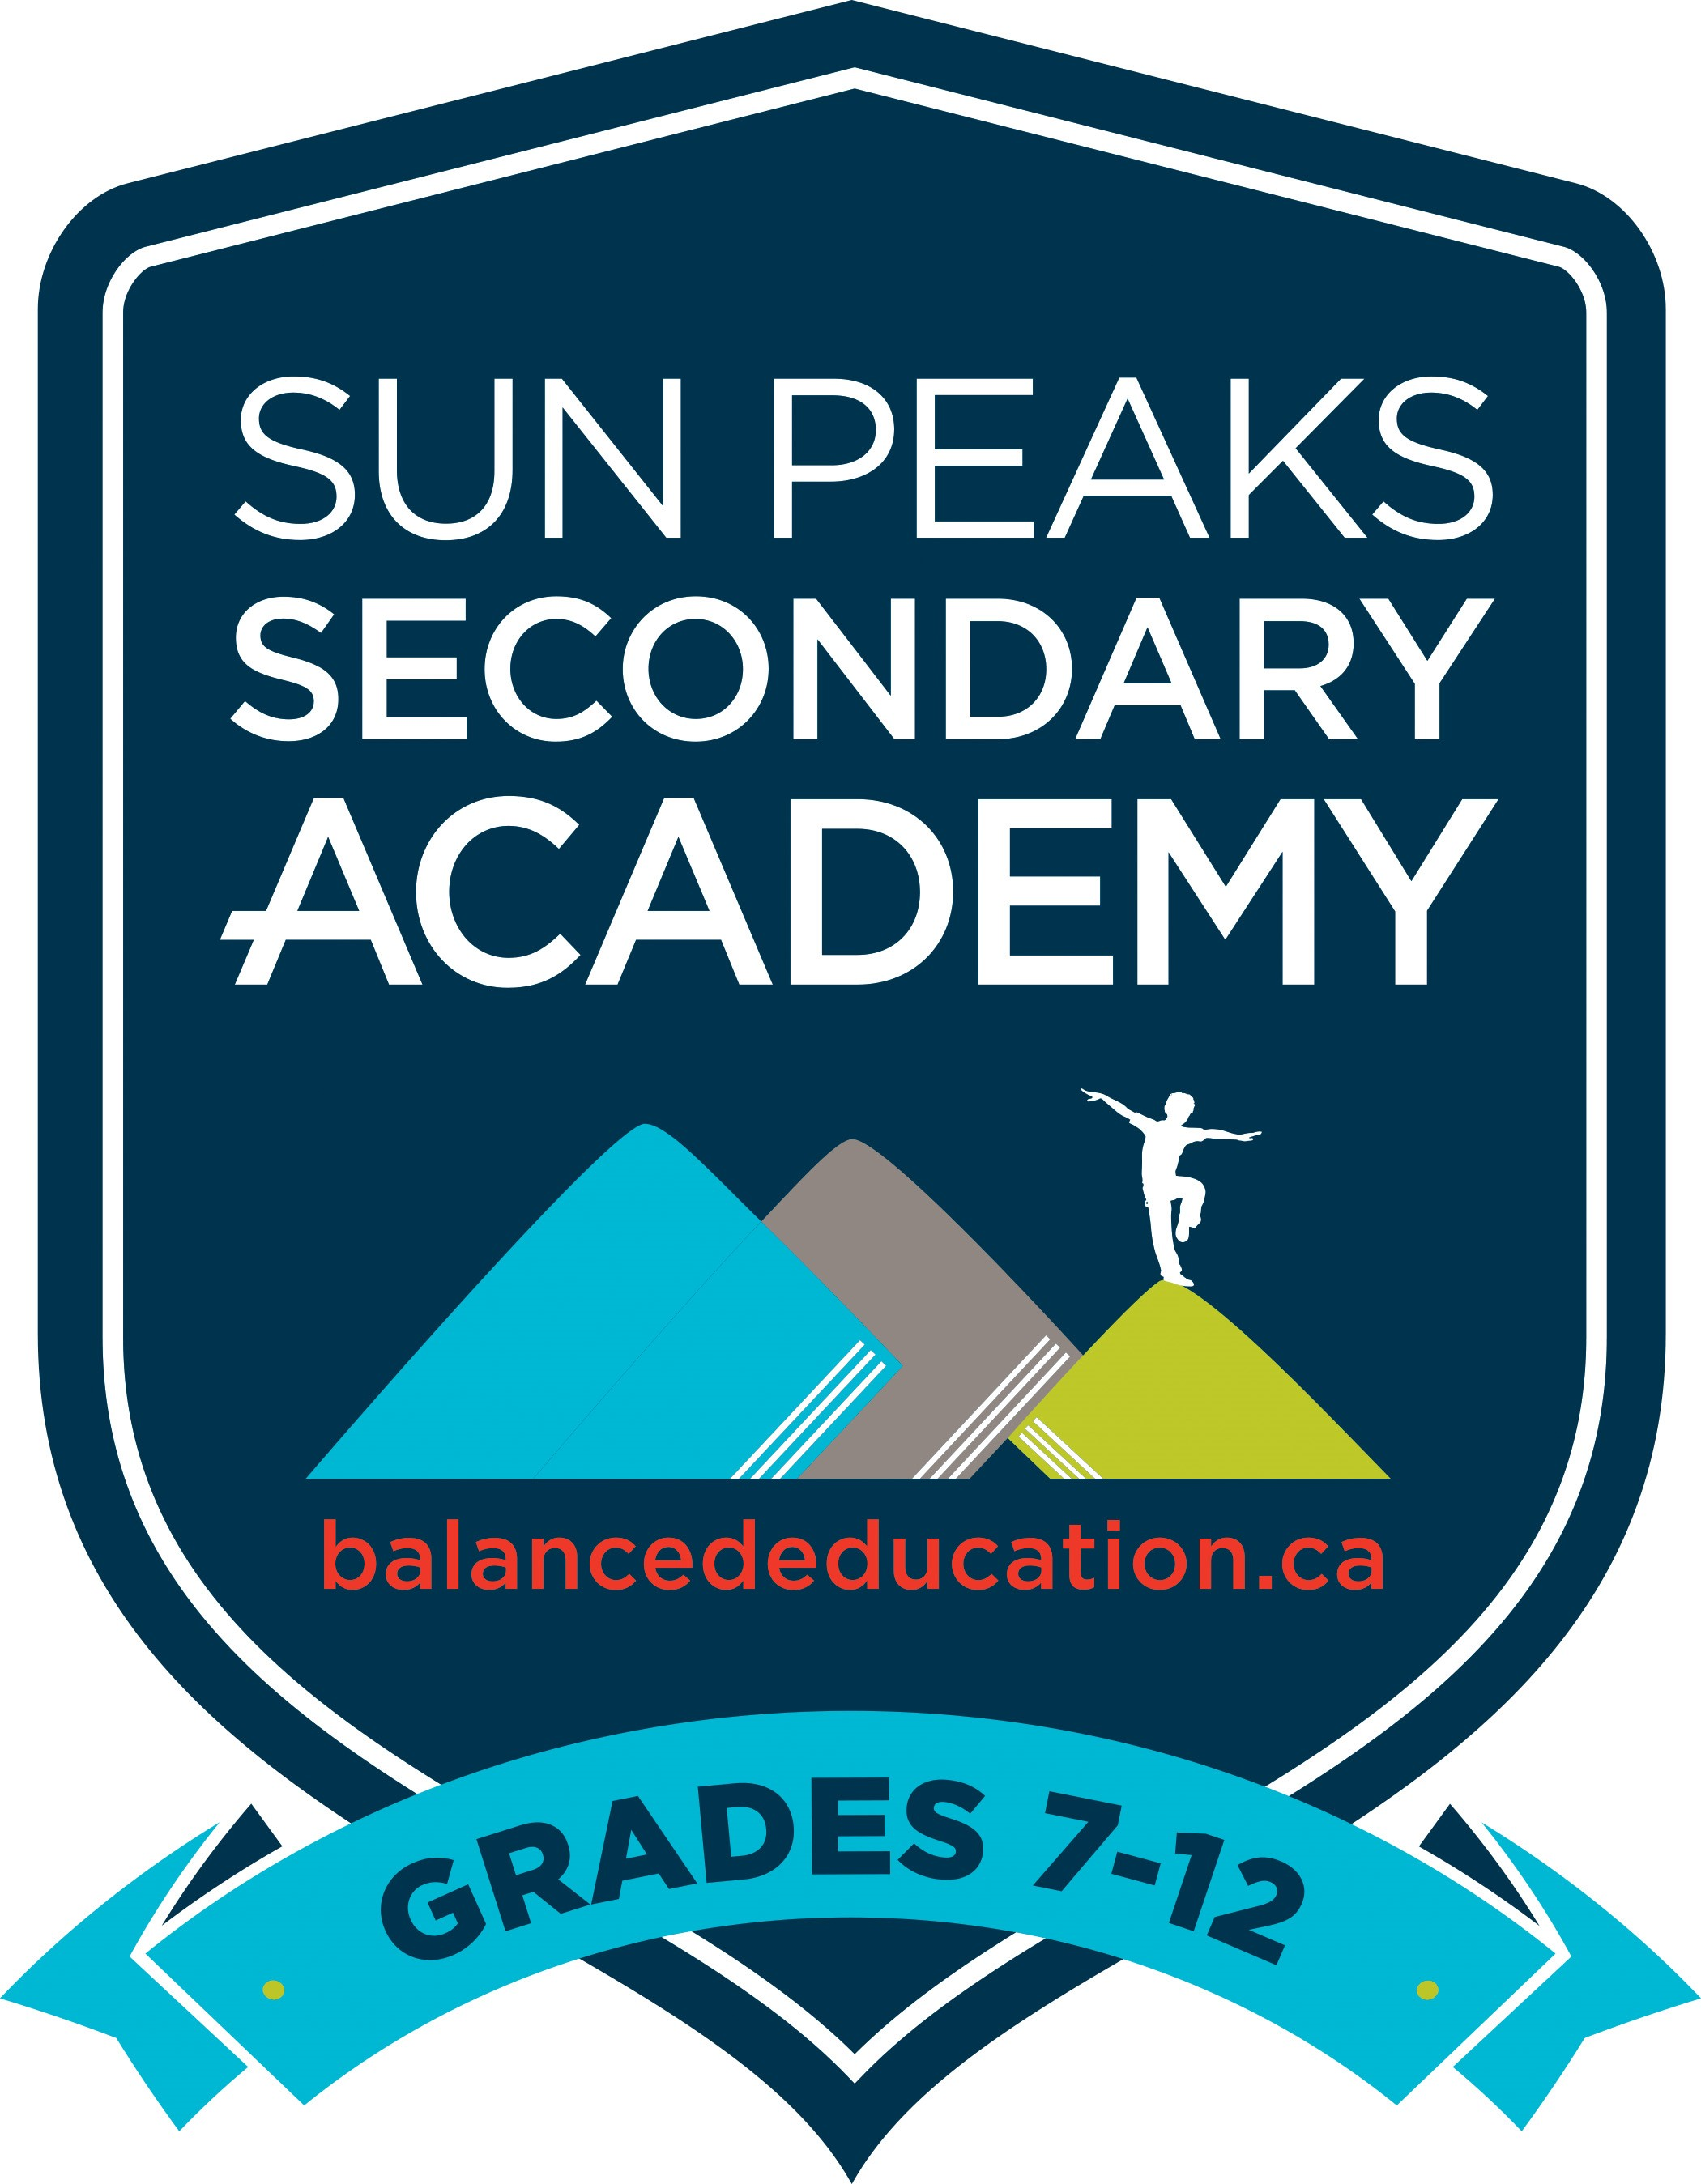 Sun Peaks Secondary Academy